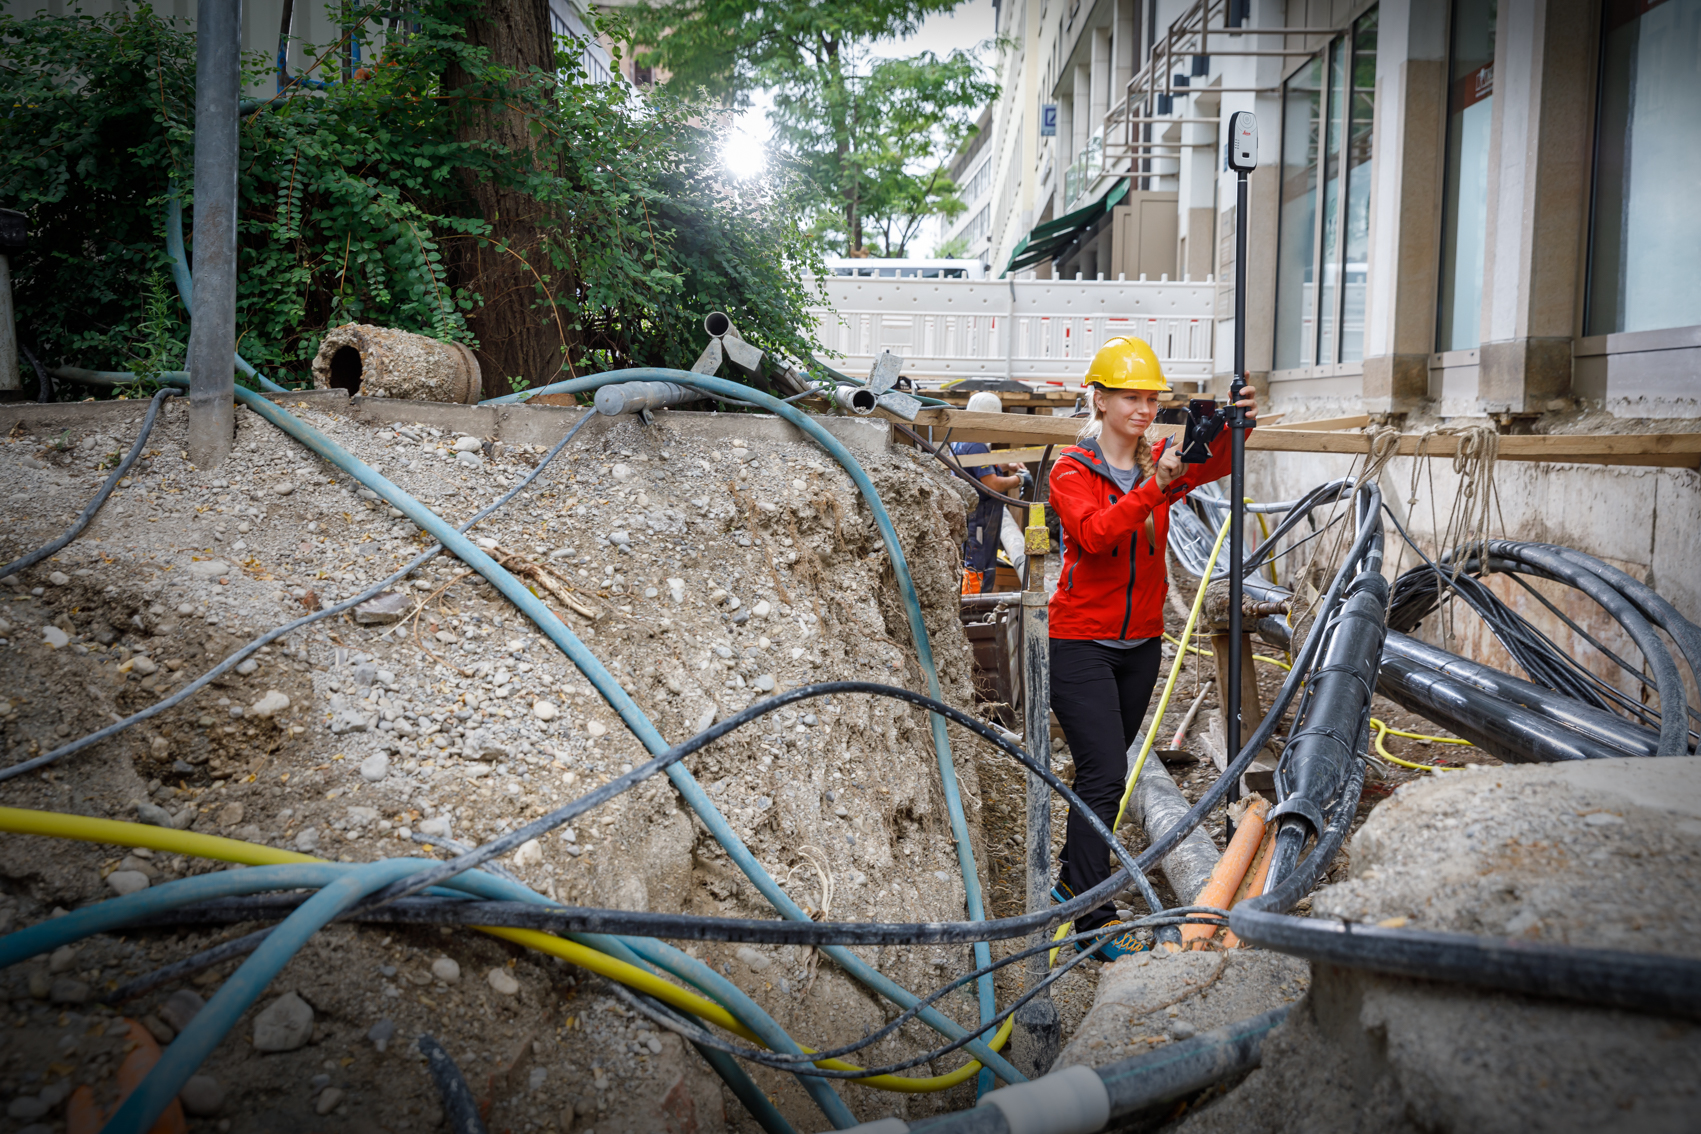 -l1a1464leica-zeno-flx100-cables-pole-phone-72-dpi-rgb.jpg